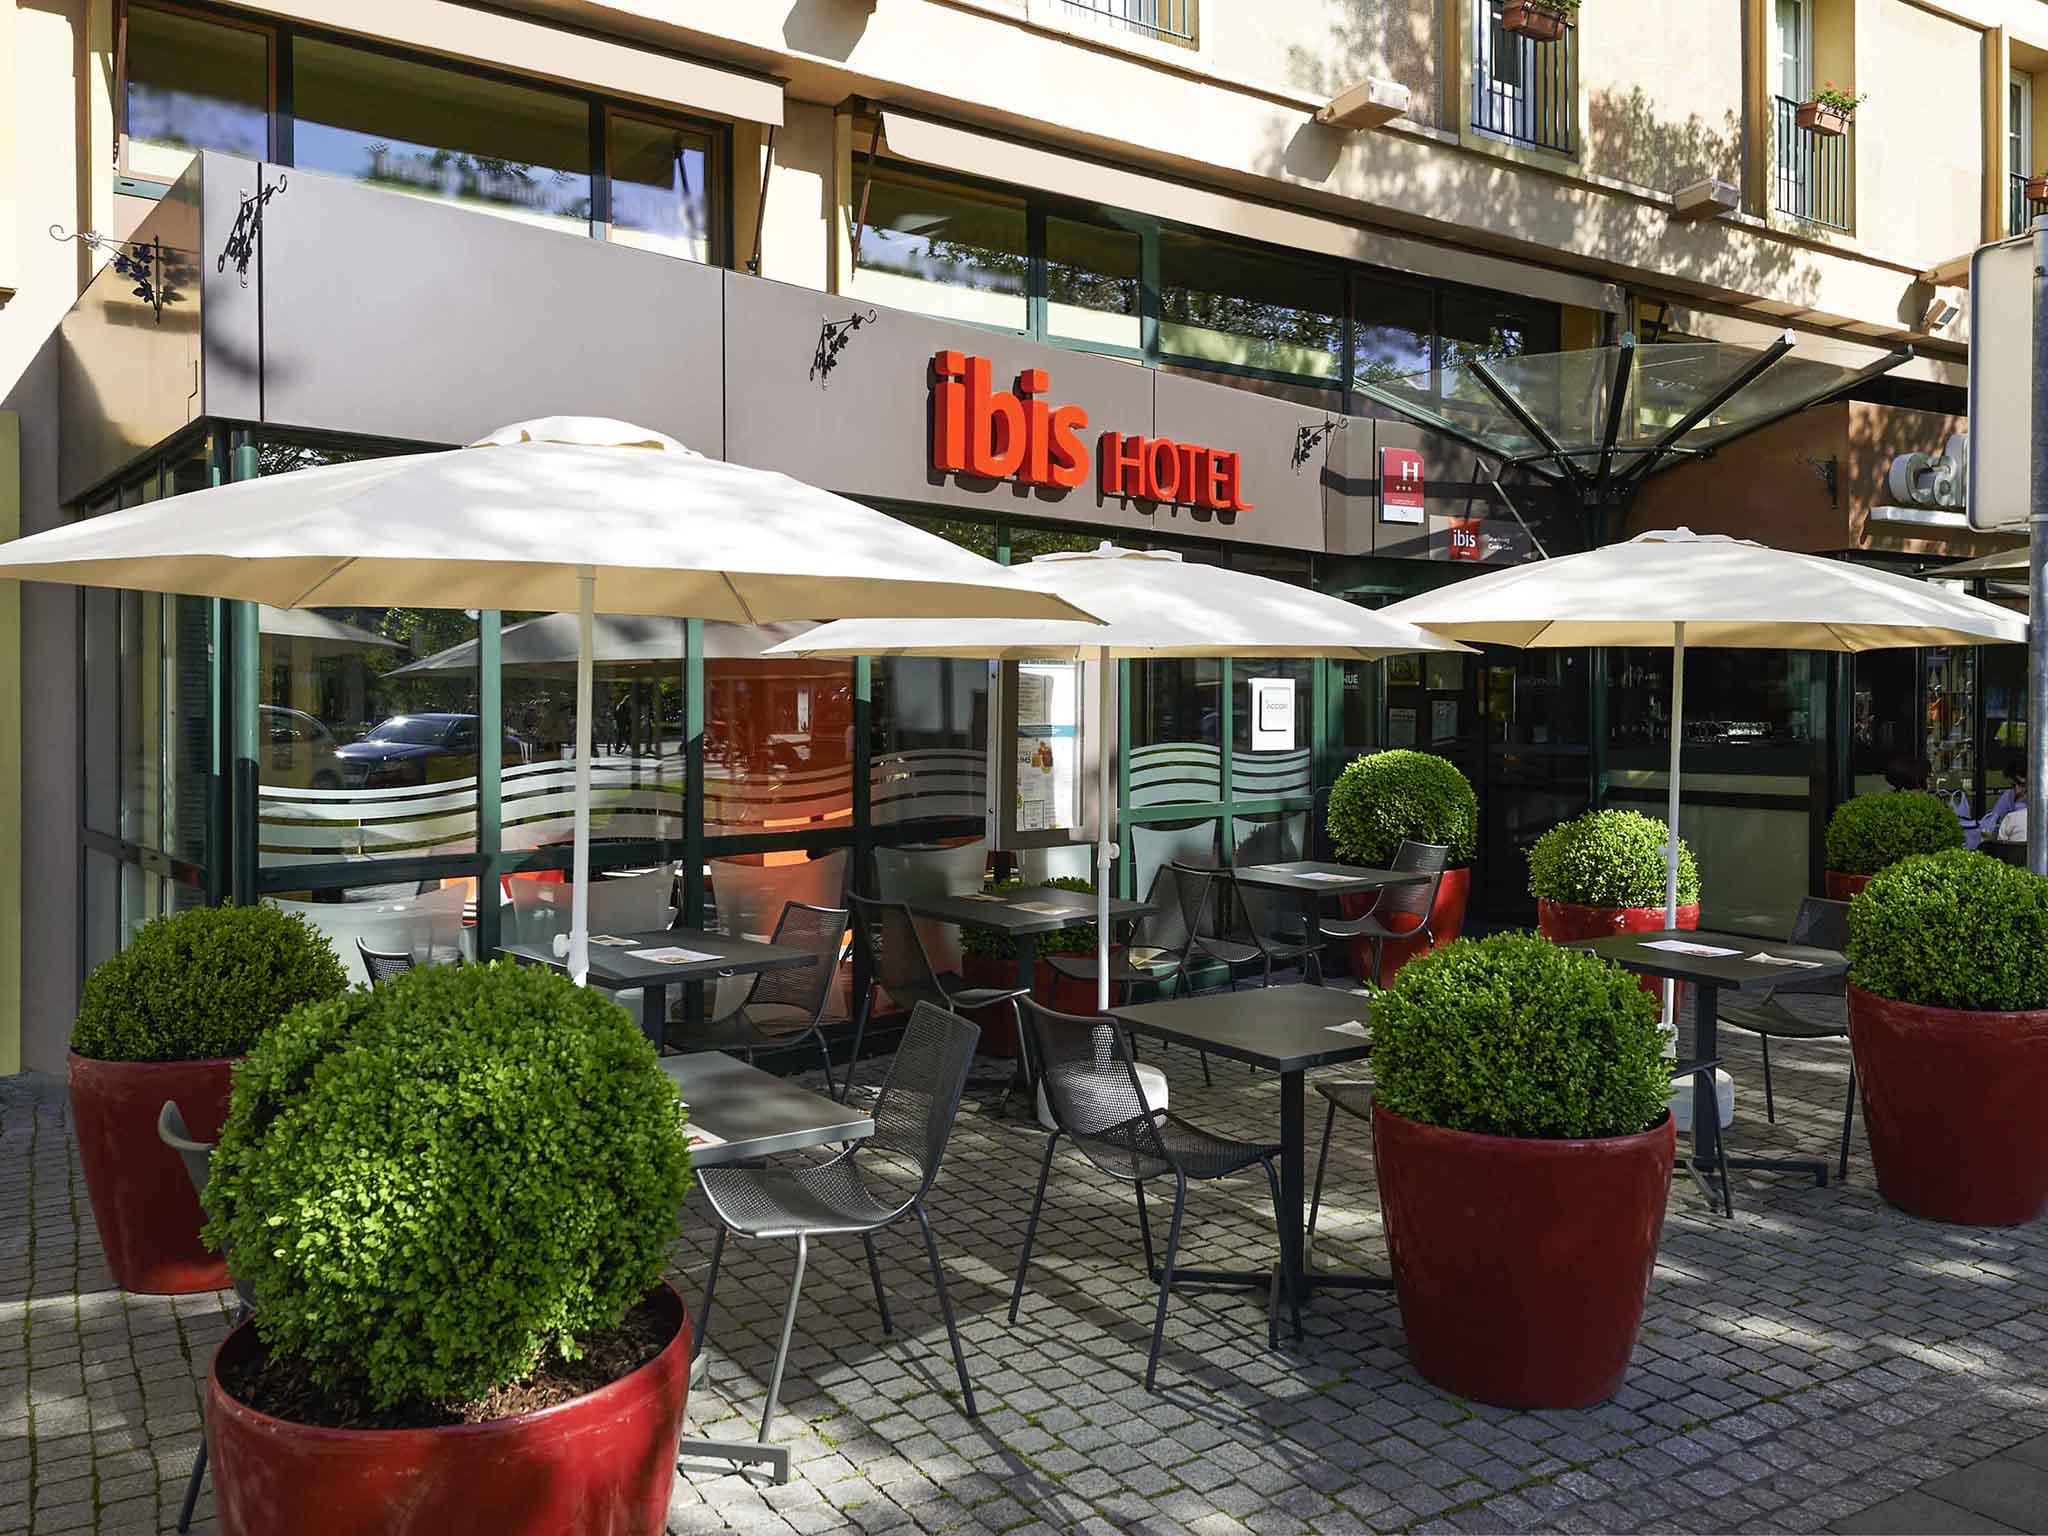 hotel in strasbourg ibis strasbourg centre gare. Black Bedroom Furniture Sets. Home Design Ideas